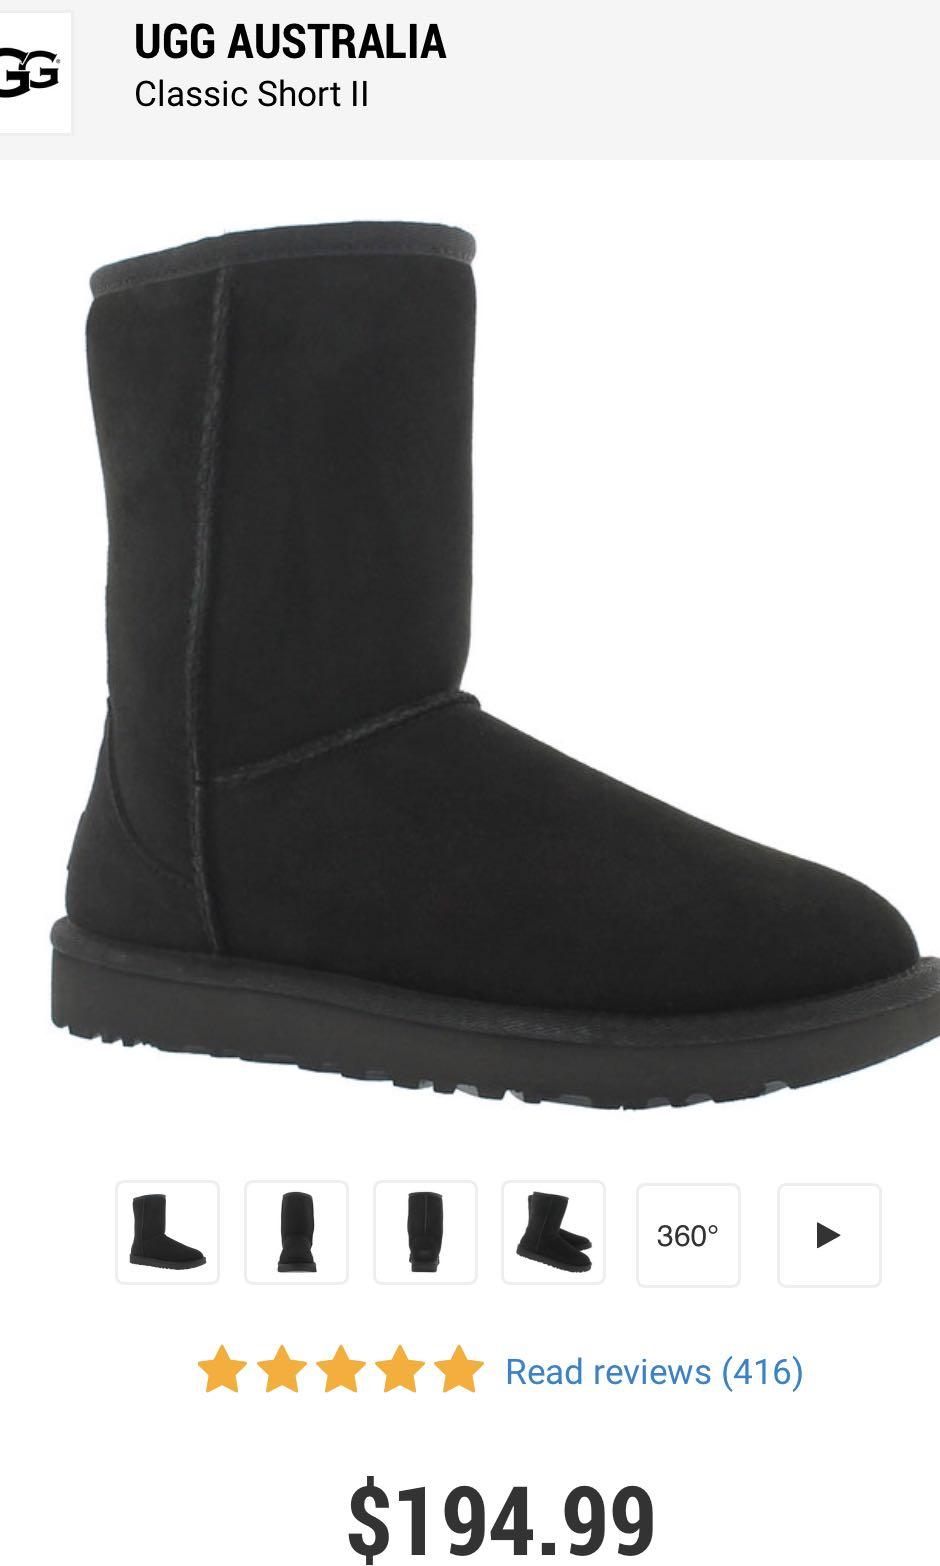 Size 7 Classic Black Uggs